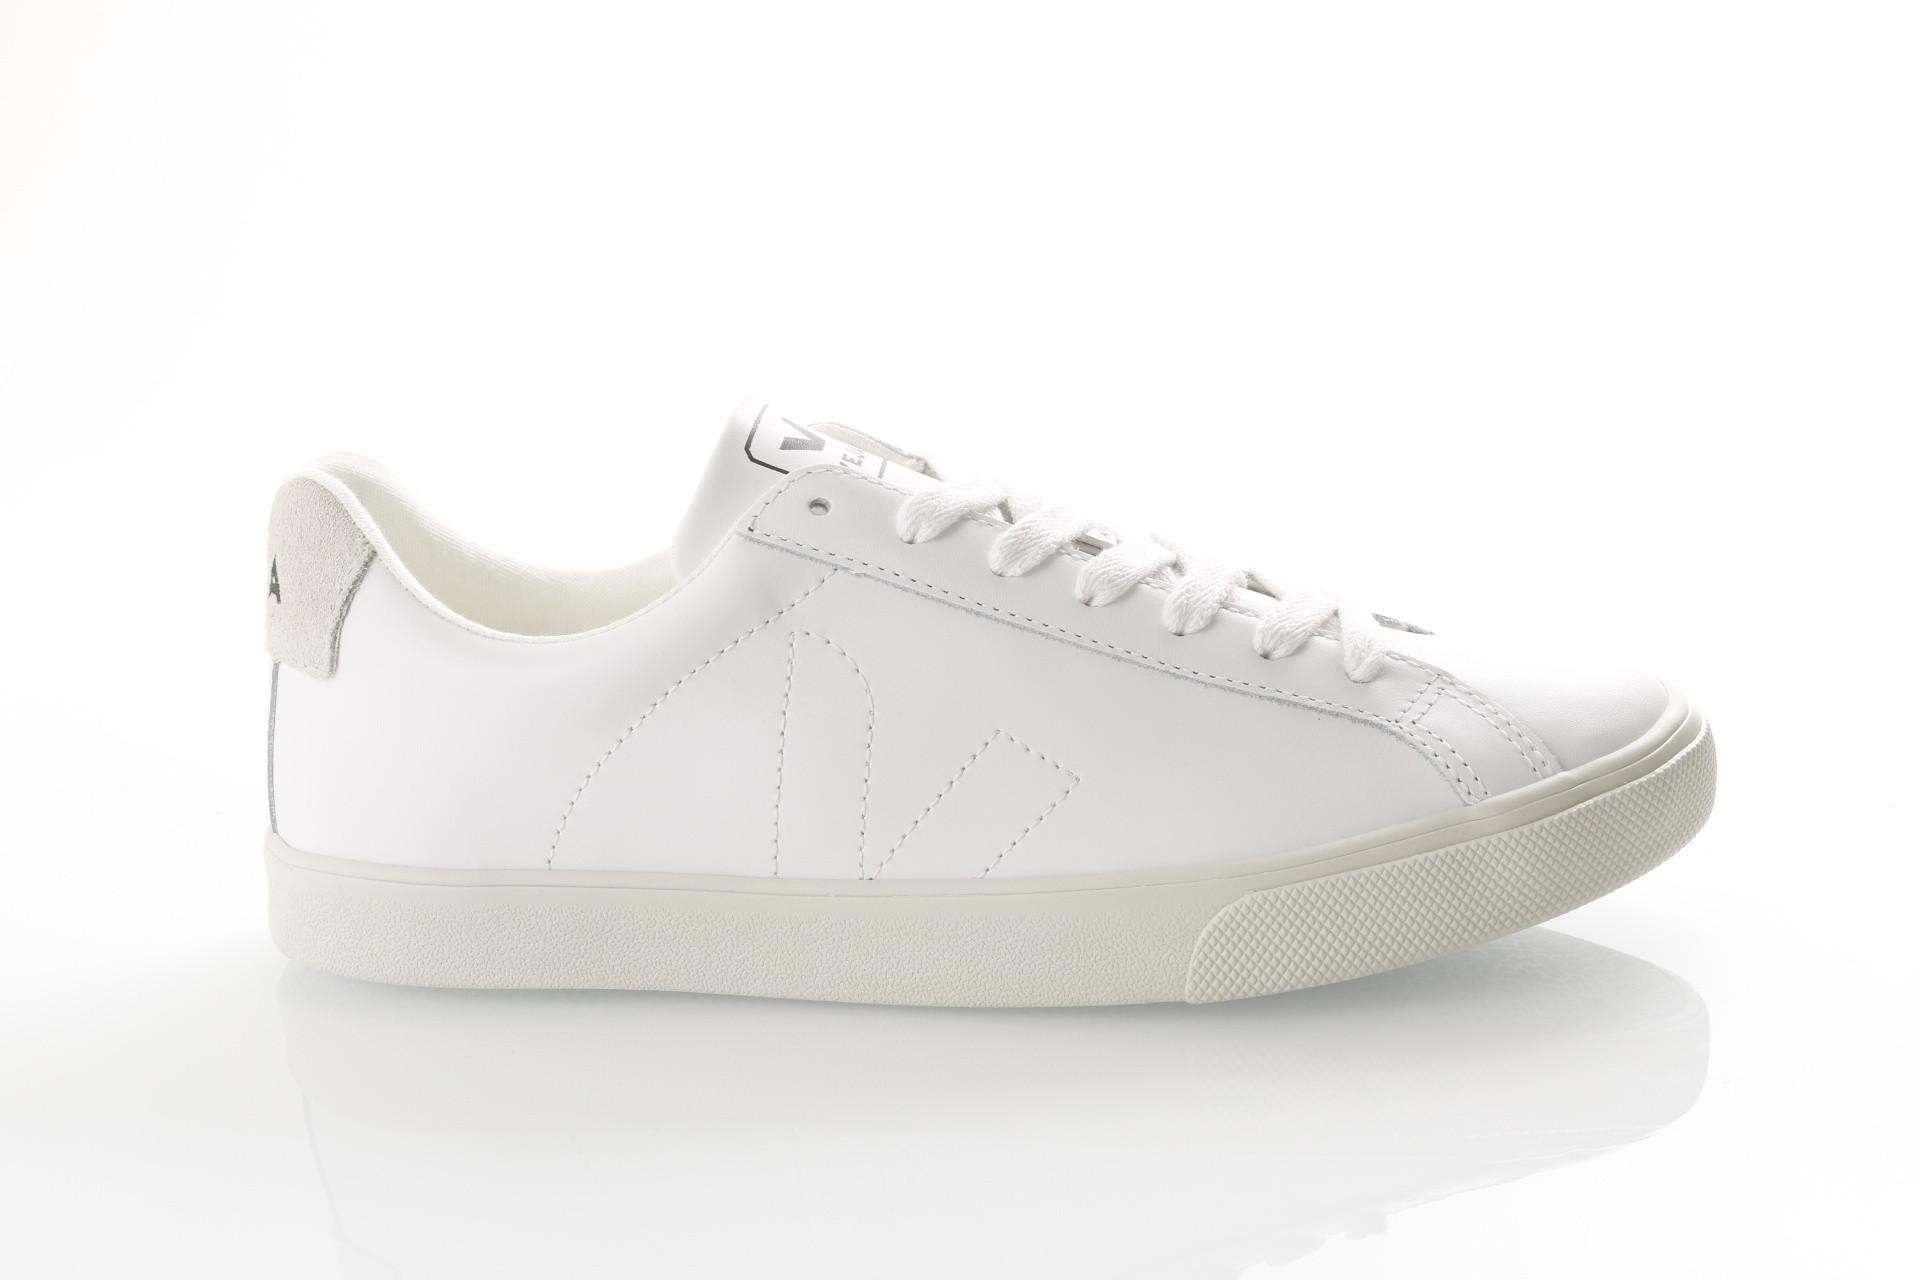 Foto van Veja Esplar Ea2001 Sneakers Extra White / Natural